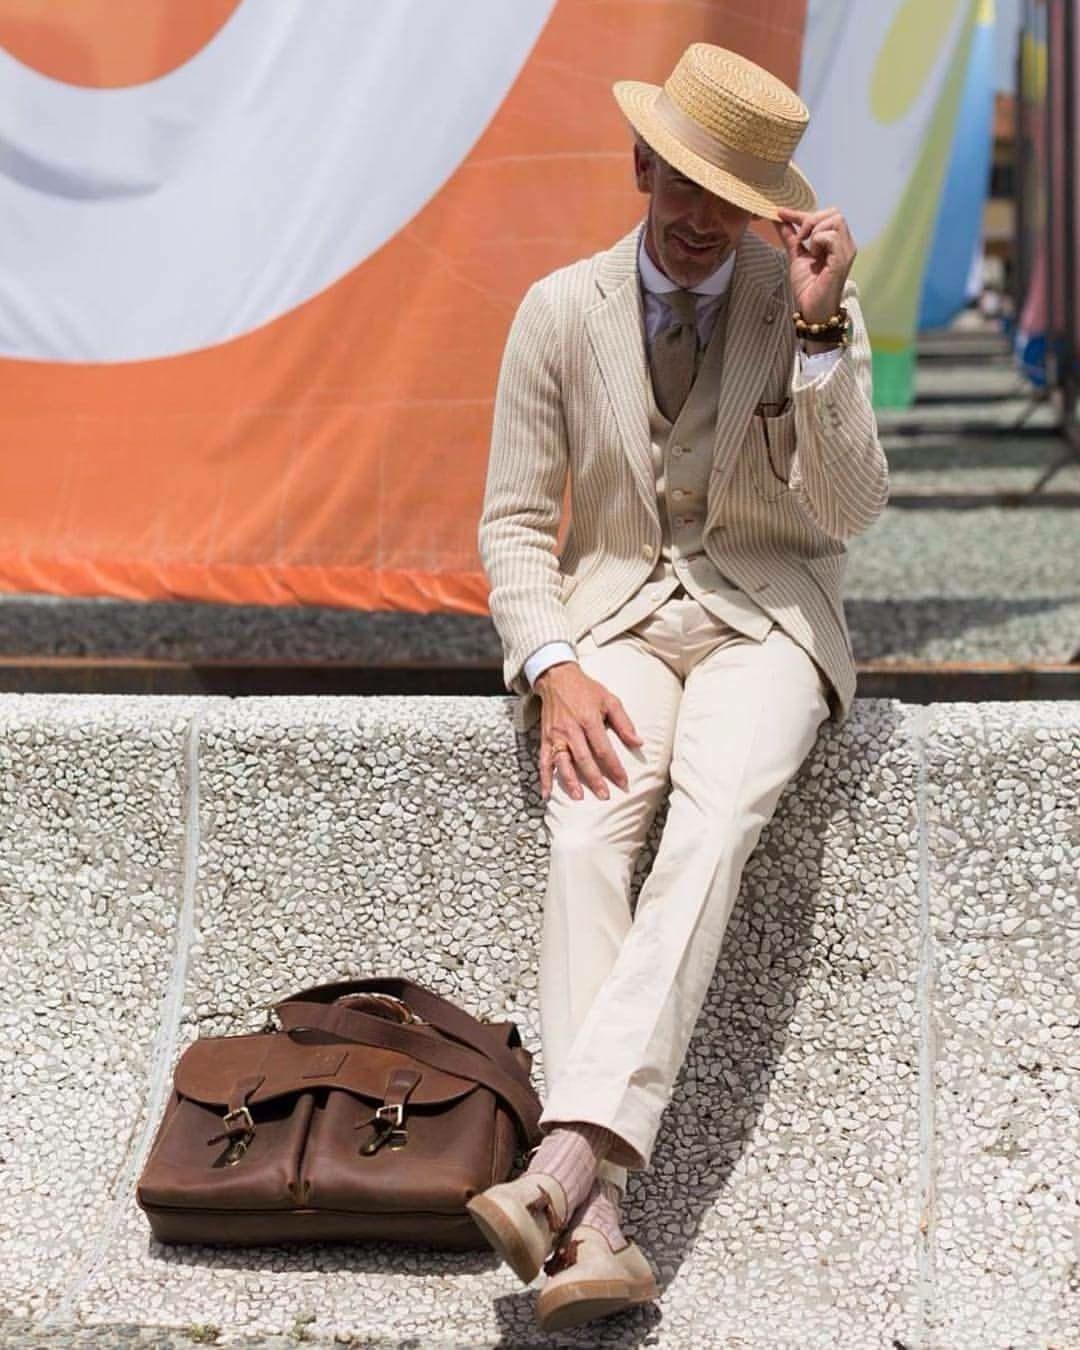 Pin by mathew pieraccini on clothing pinterest style men dapper